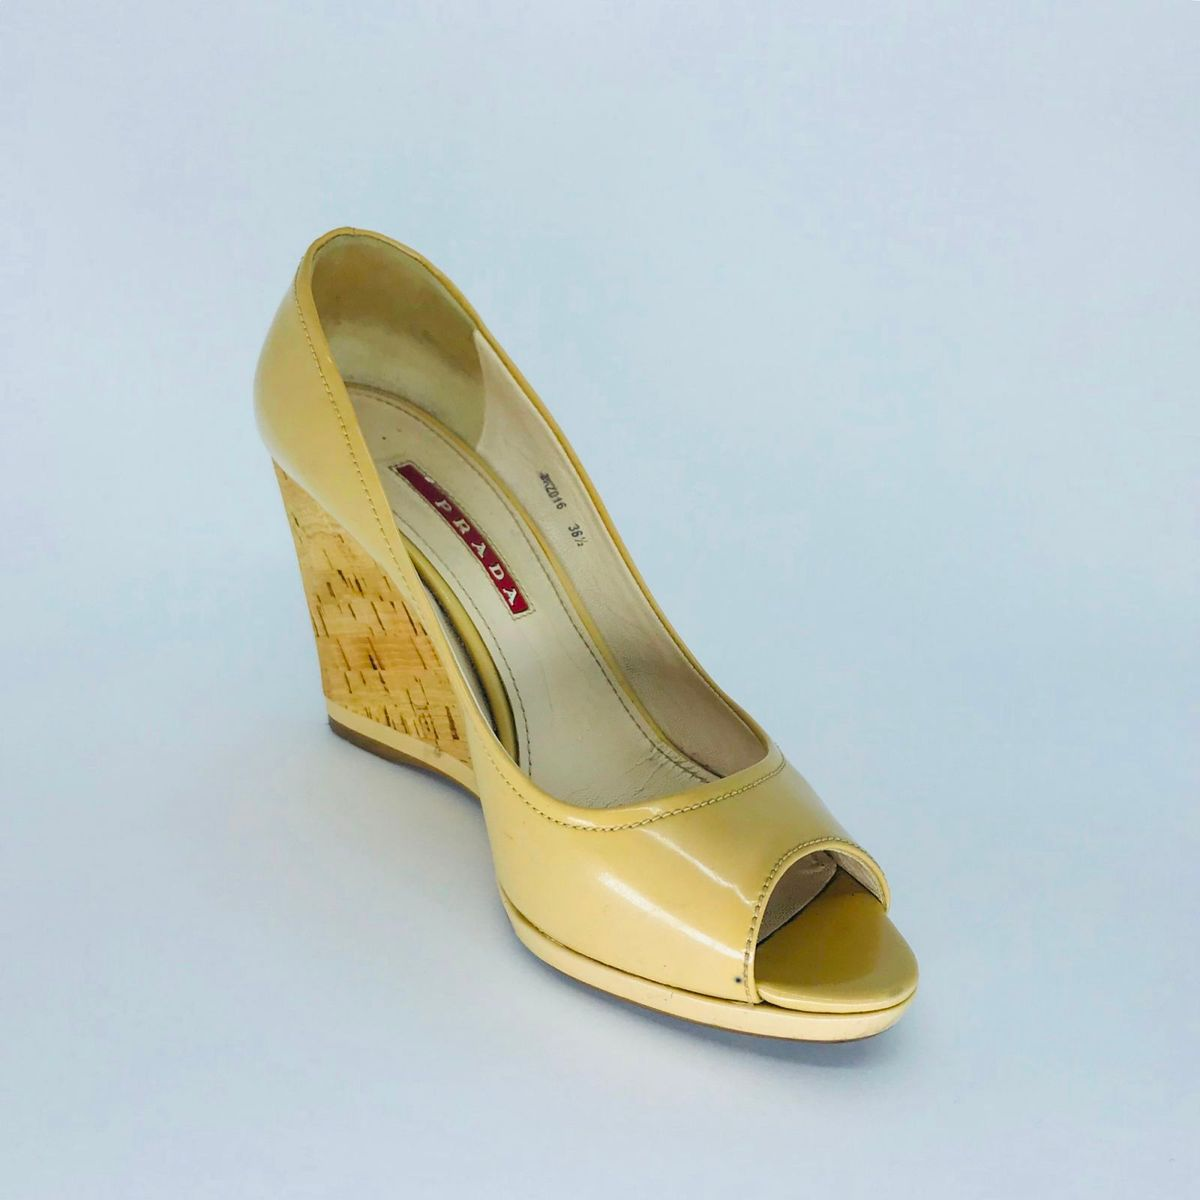 45ab12634 Sapato Prada | Sapato Feminino Prada Usado 30051111 | enjoei